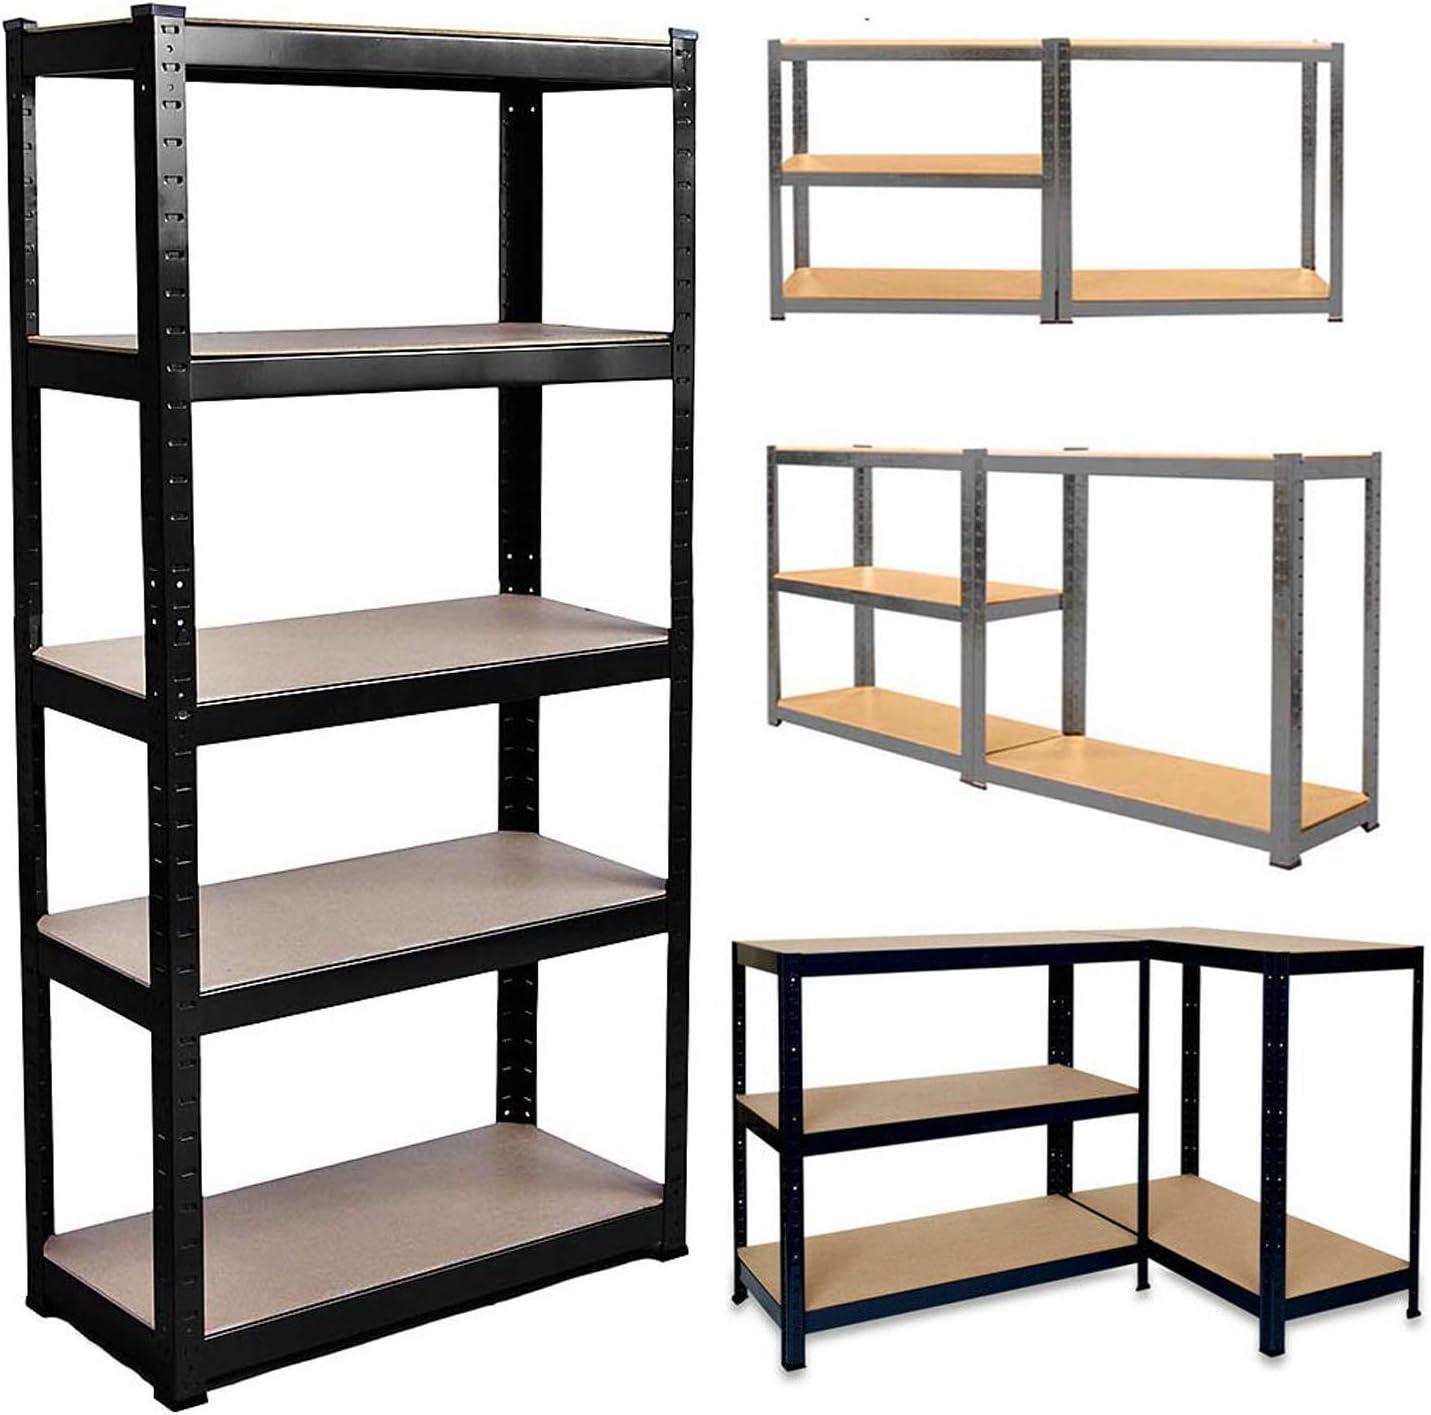 1Pcs 150cm x 70cm x 30cm 5 Tier Heavy Duty Metal Shelving, Racking Storage Unit, Galvanised(175KG Per Shelf), 875KG Capacity Garage Shed Storage Shelving Units,